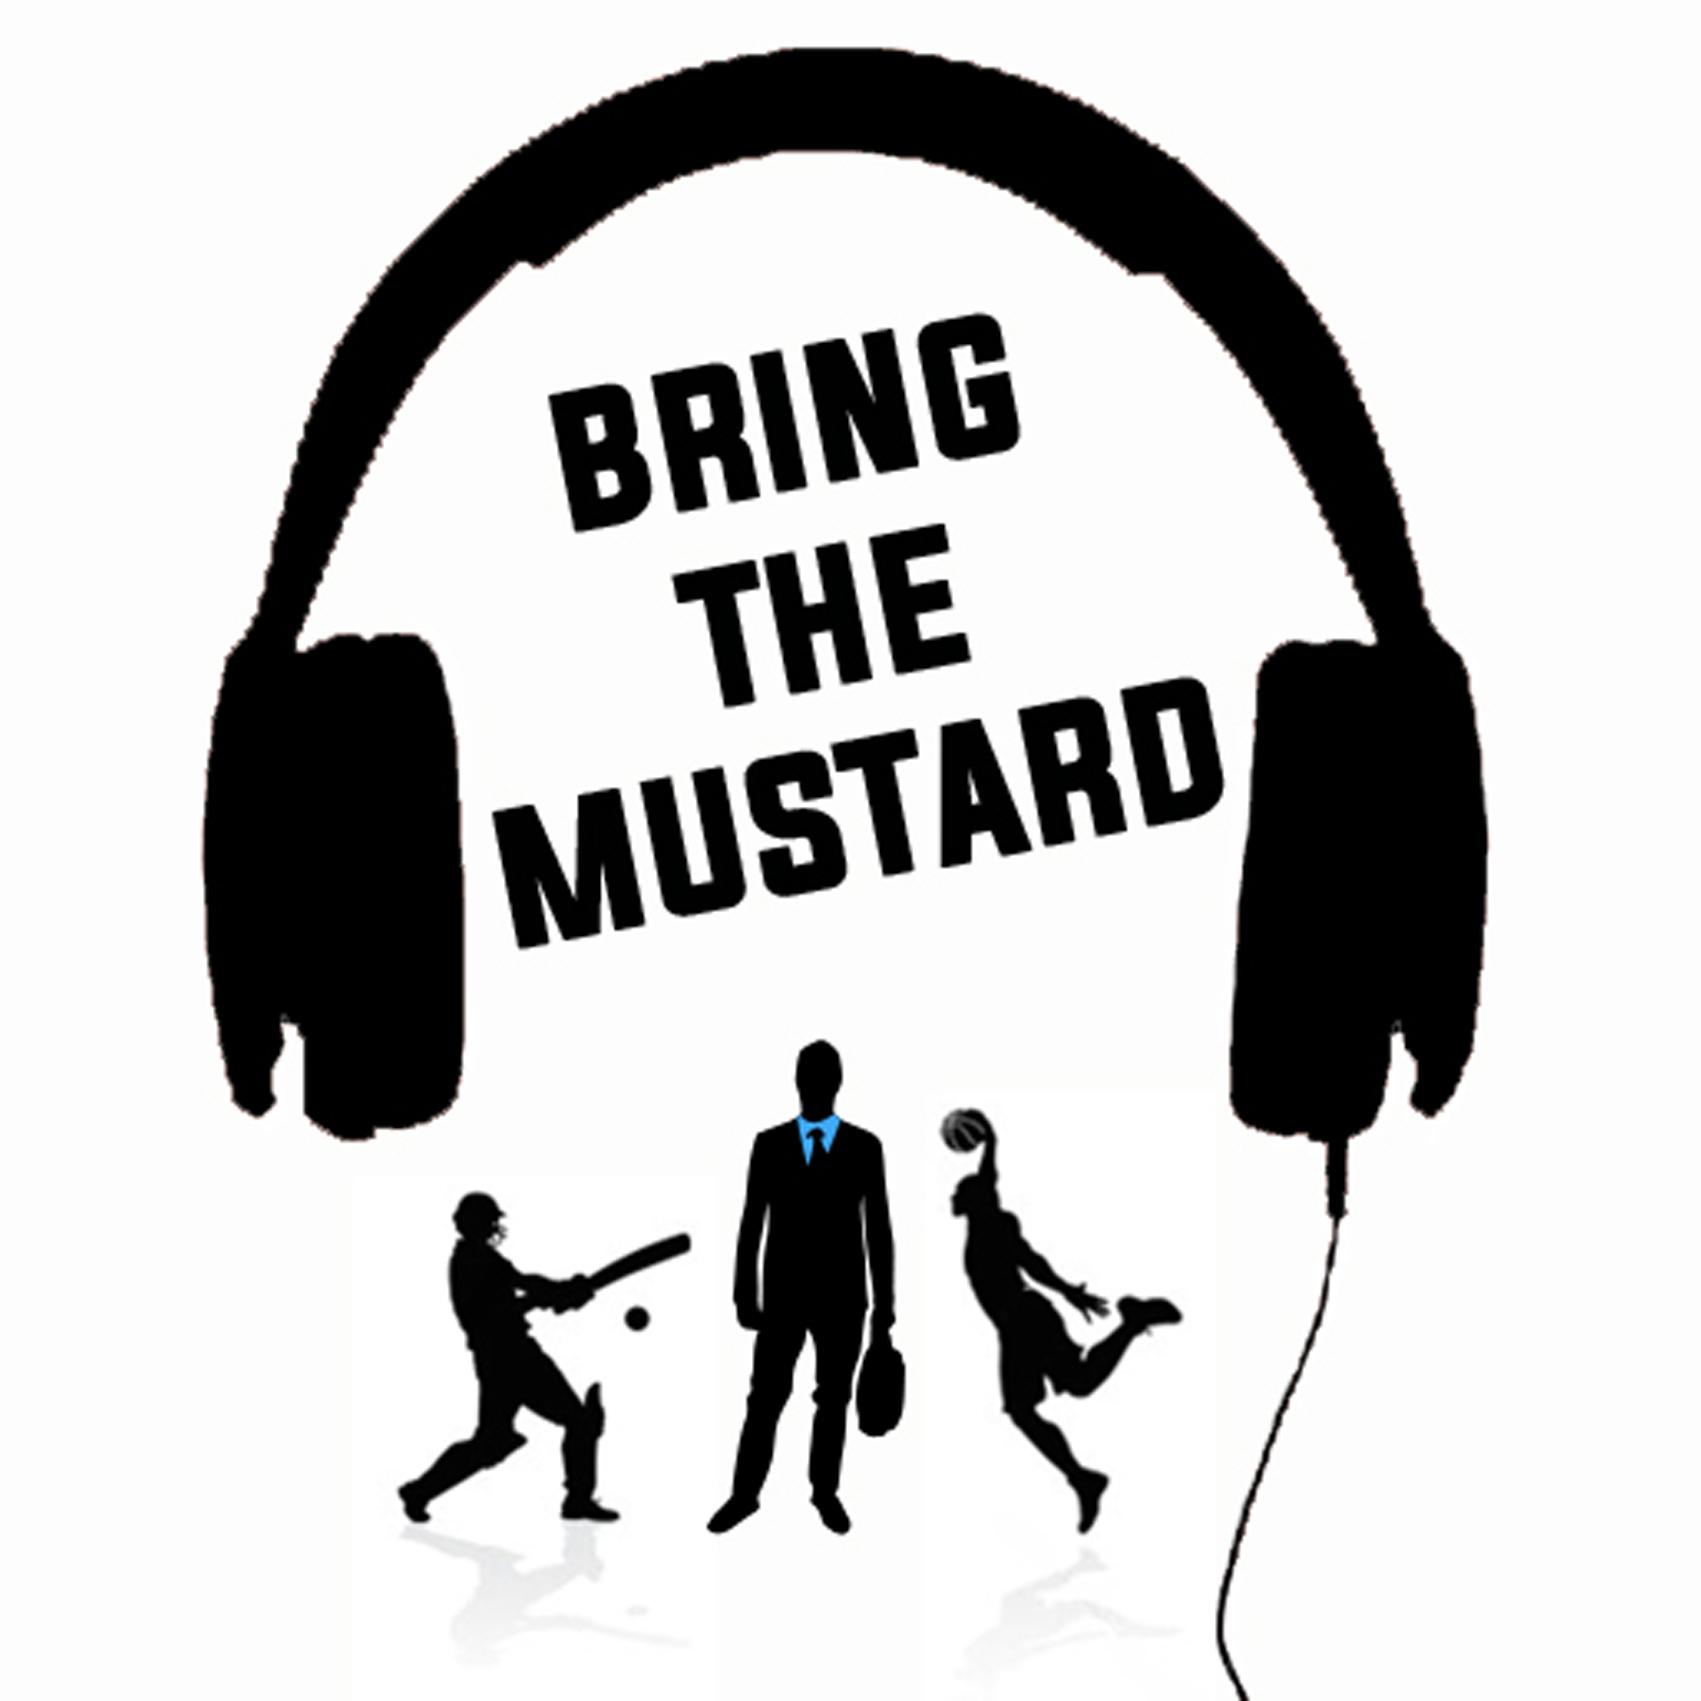 Bring The Mustard